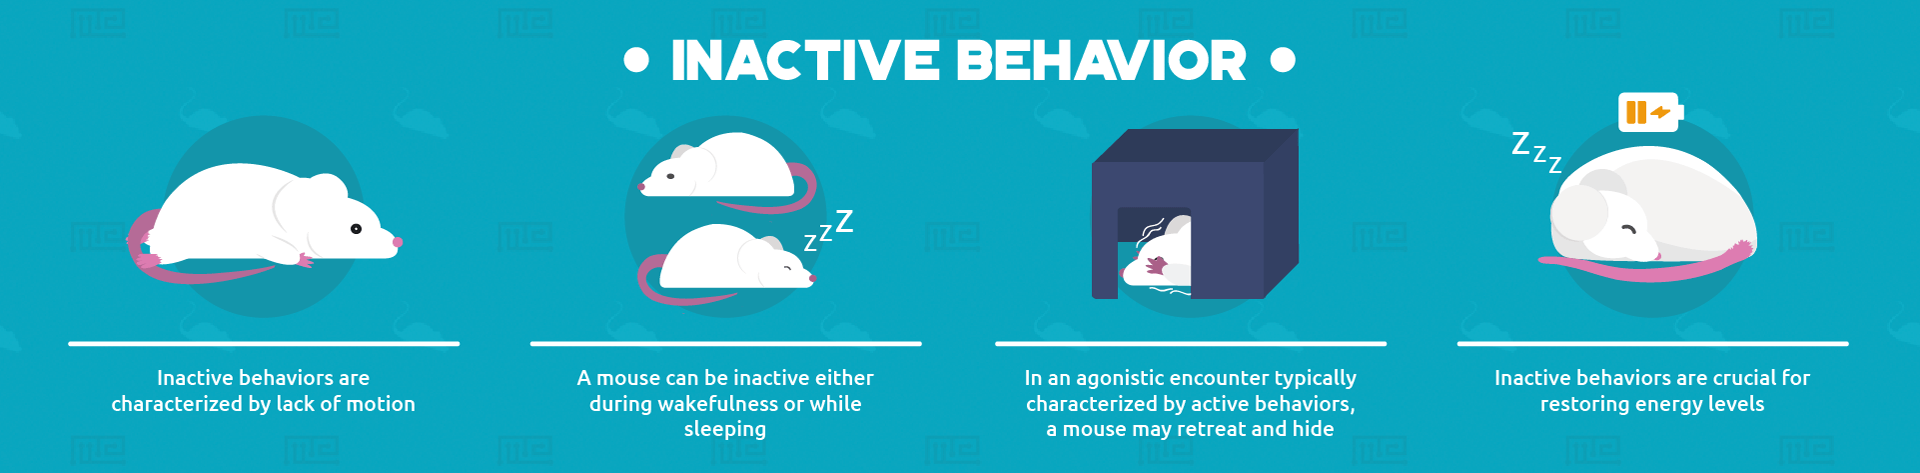 inactive behaviors infographic